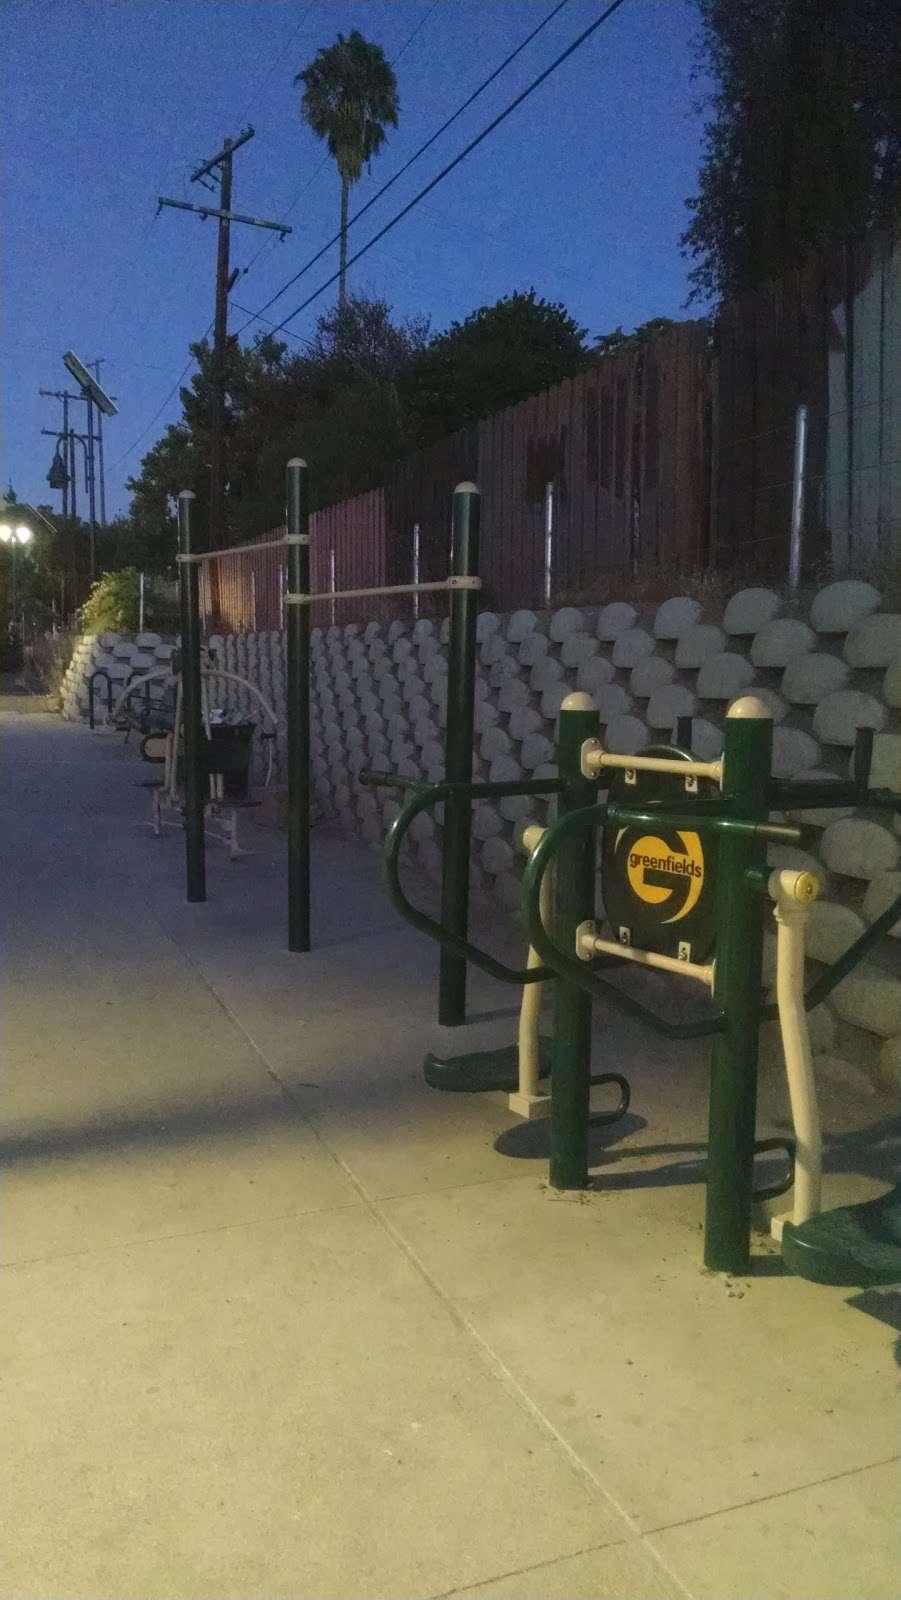 Luis Fitness Equipment - gym  | Photo 1 of 1 | Address: Winnetka, CA 91306, USA